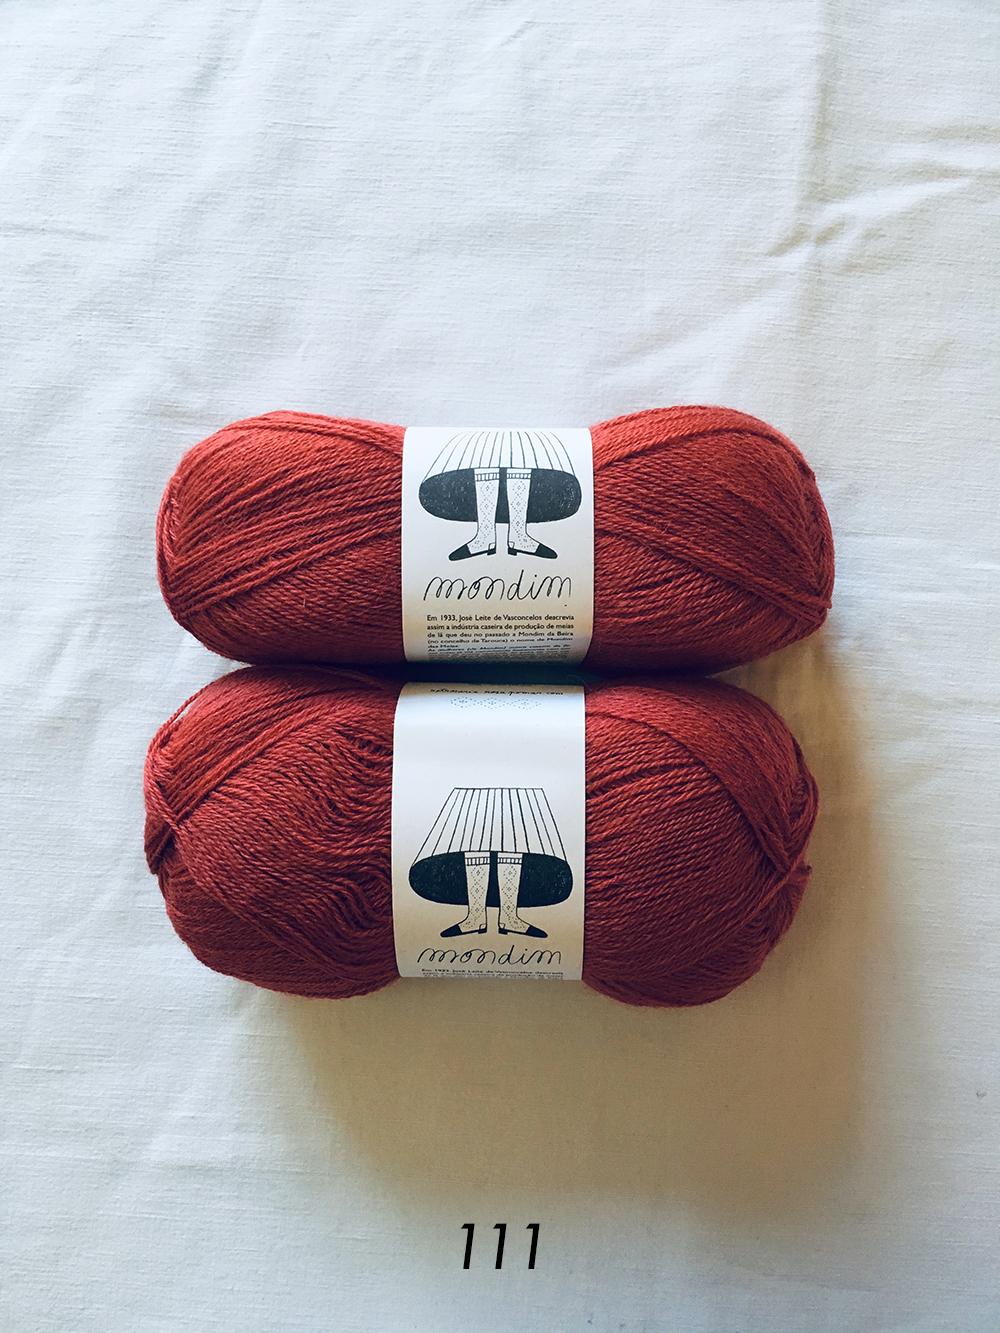 retrosaria_mondim_111_wool_done_knitting_.jpg